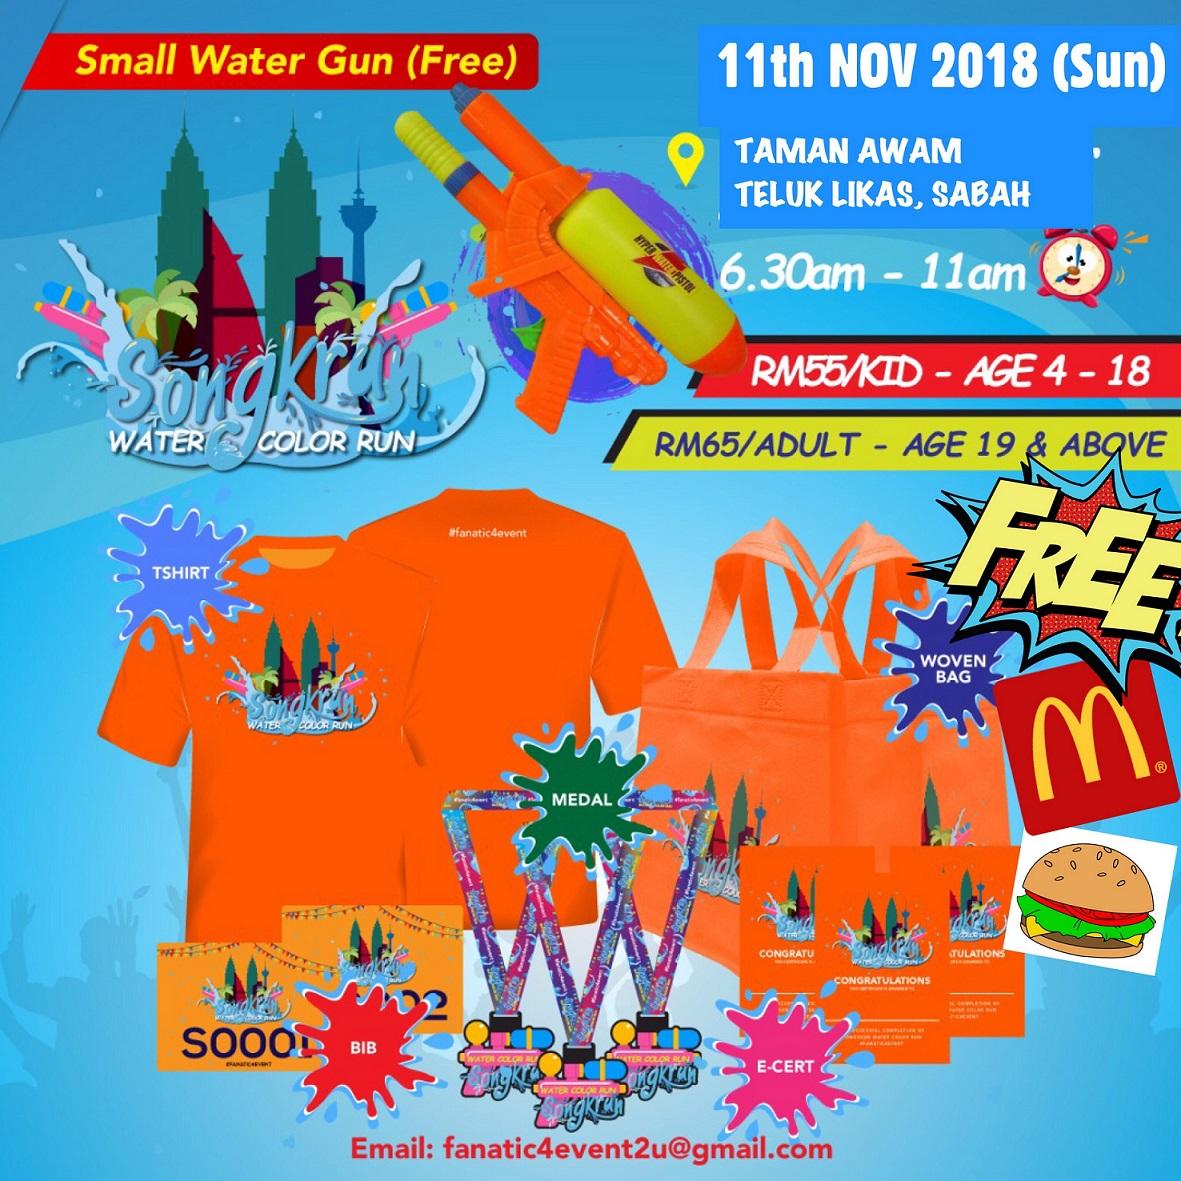 Songkrun Water Color Run 2018 - Race Connections